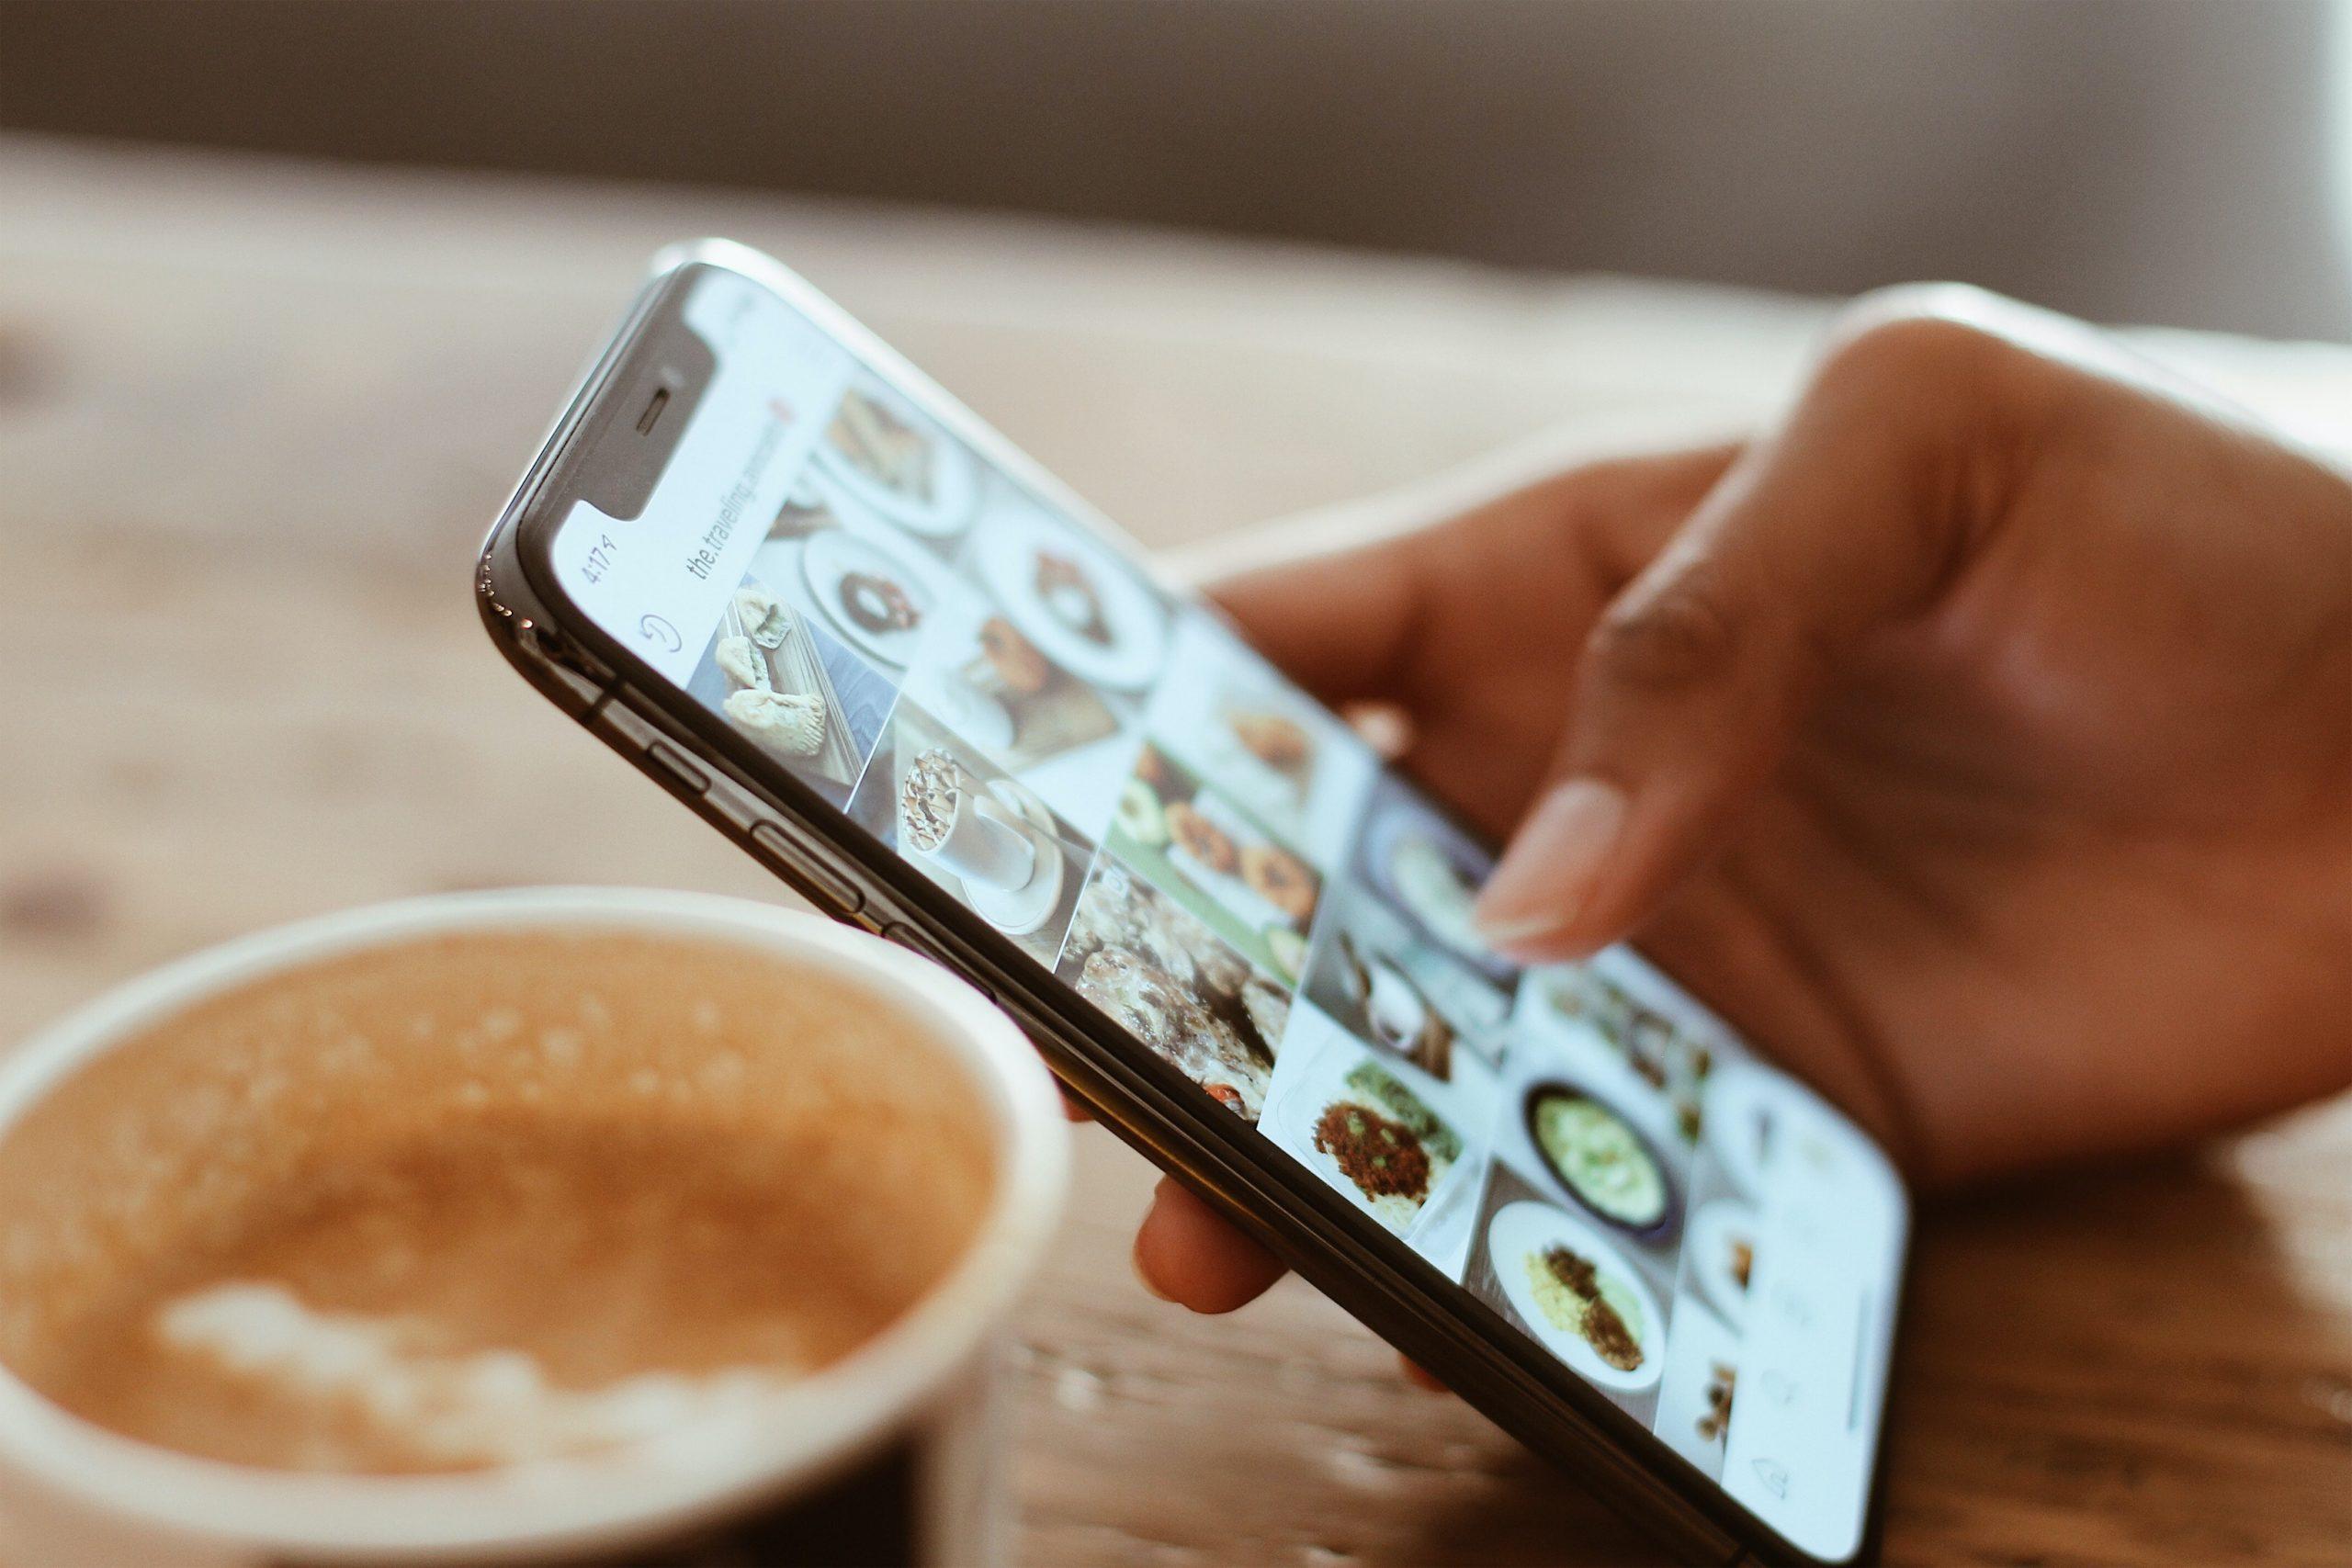 man using social media on iphone